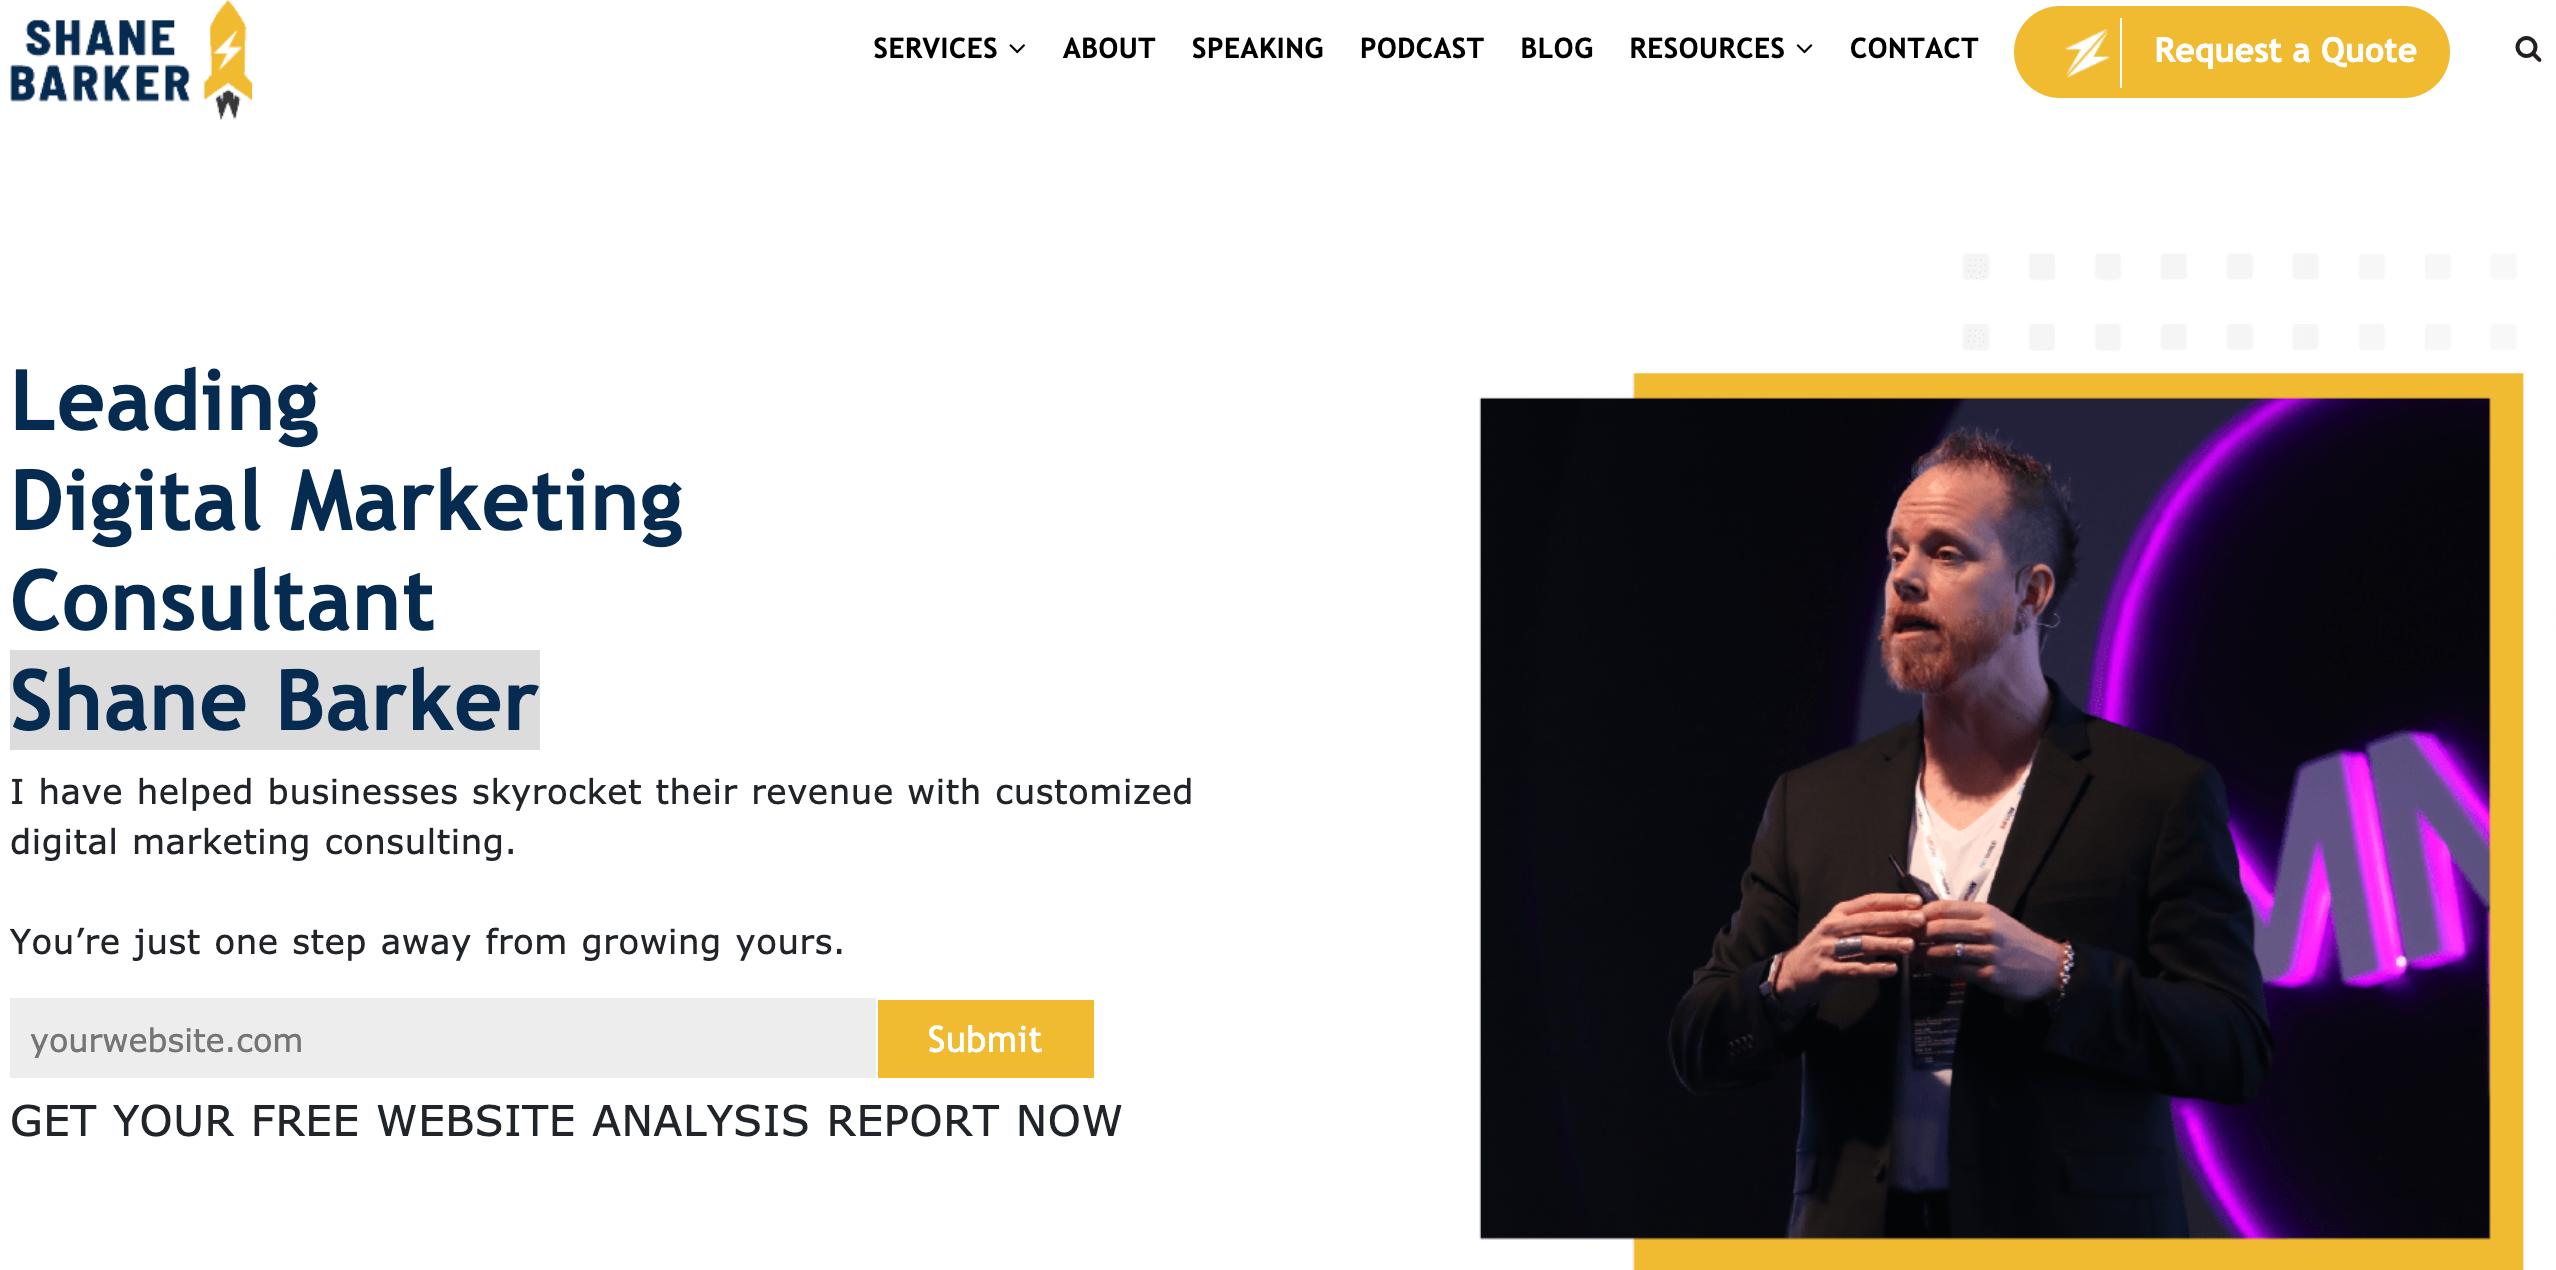 Shane Barker- a famous Digital Marketing Consultant